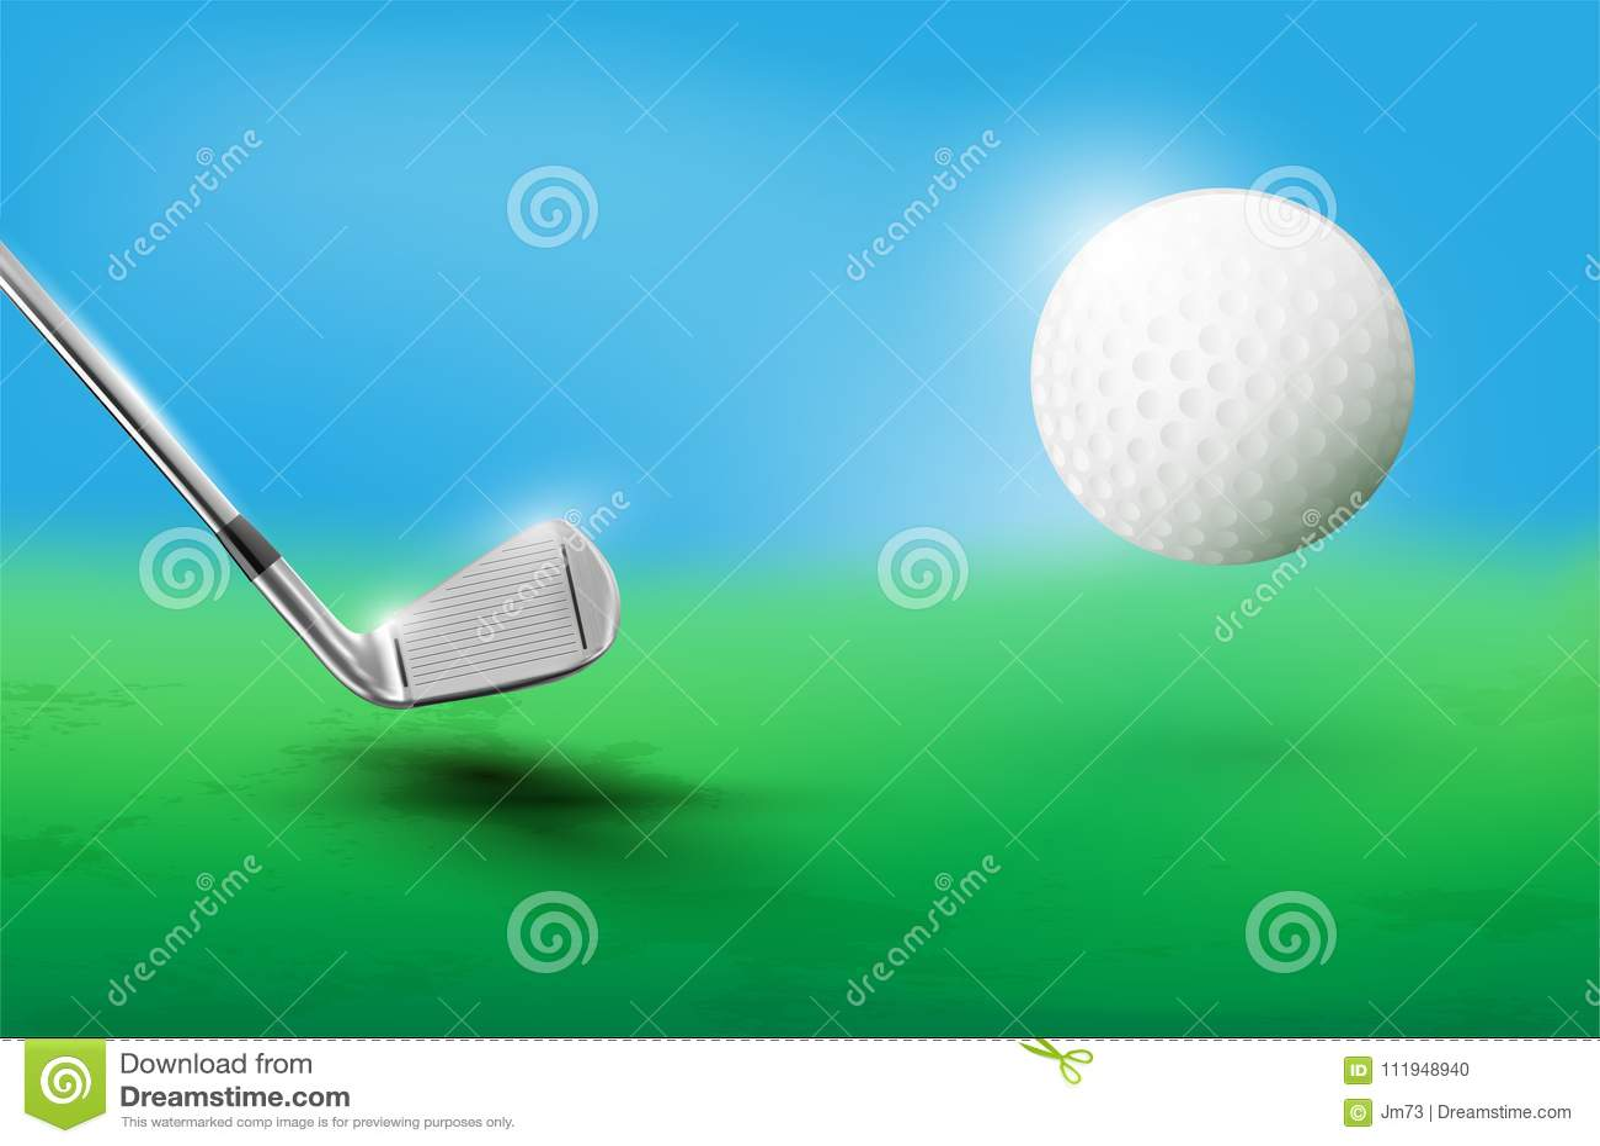 Golf club and flying golf ball